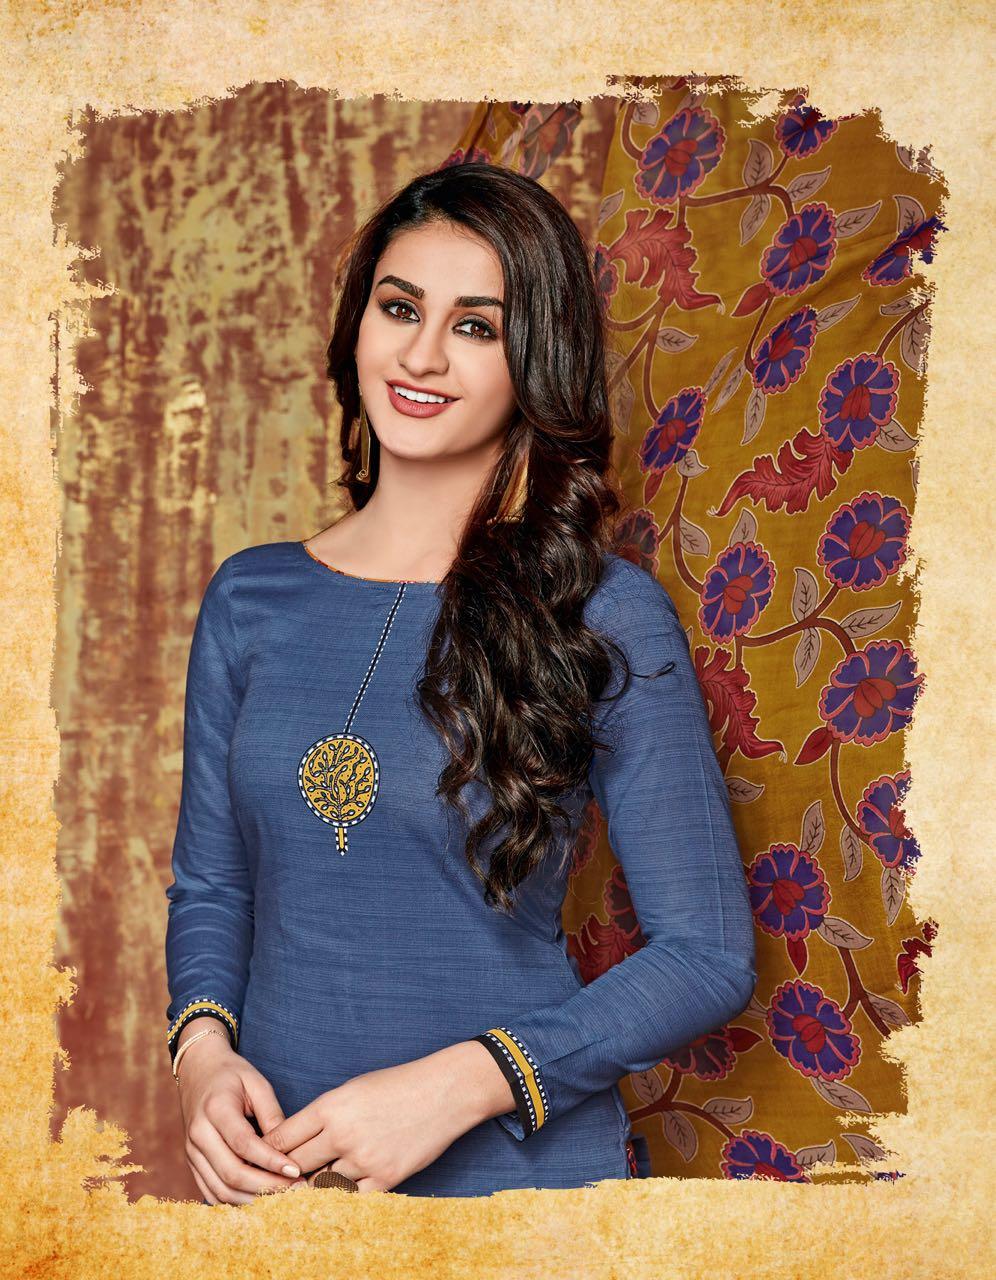 Mcm Life Style Presents Prem Ratan Vol 2 Pure Cotton With Chiffon Shawl Wholesale Price - 390